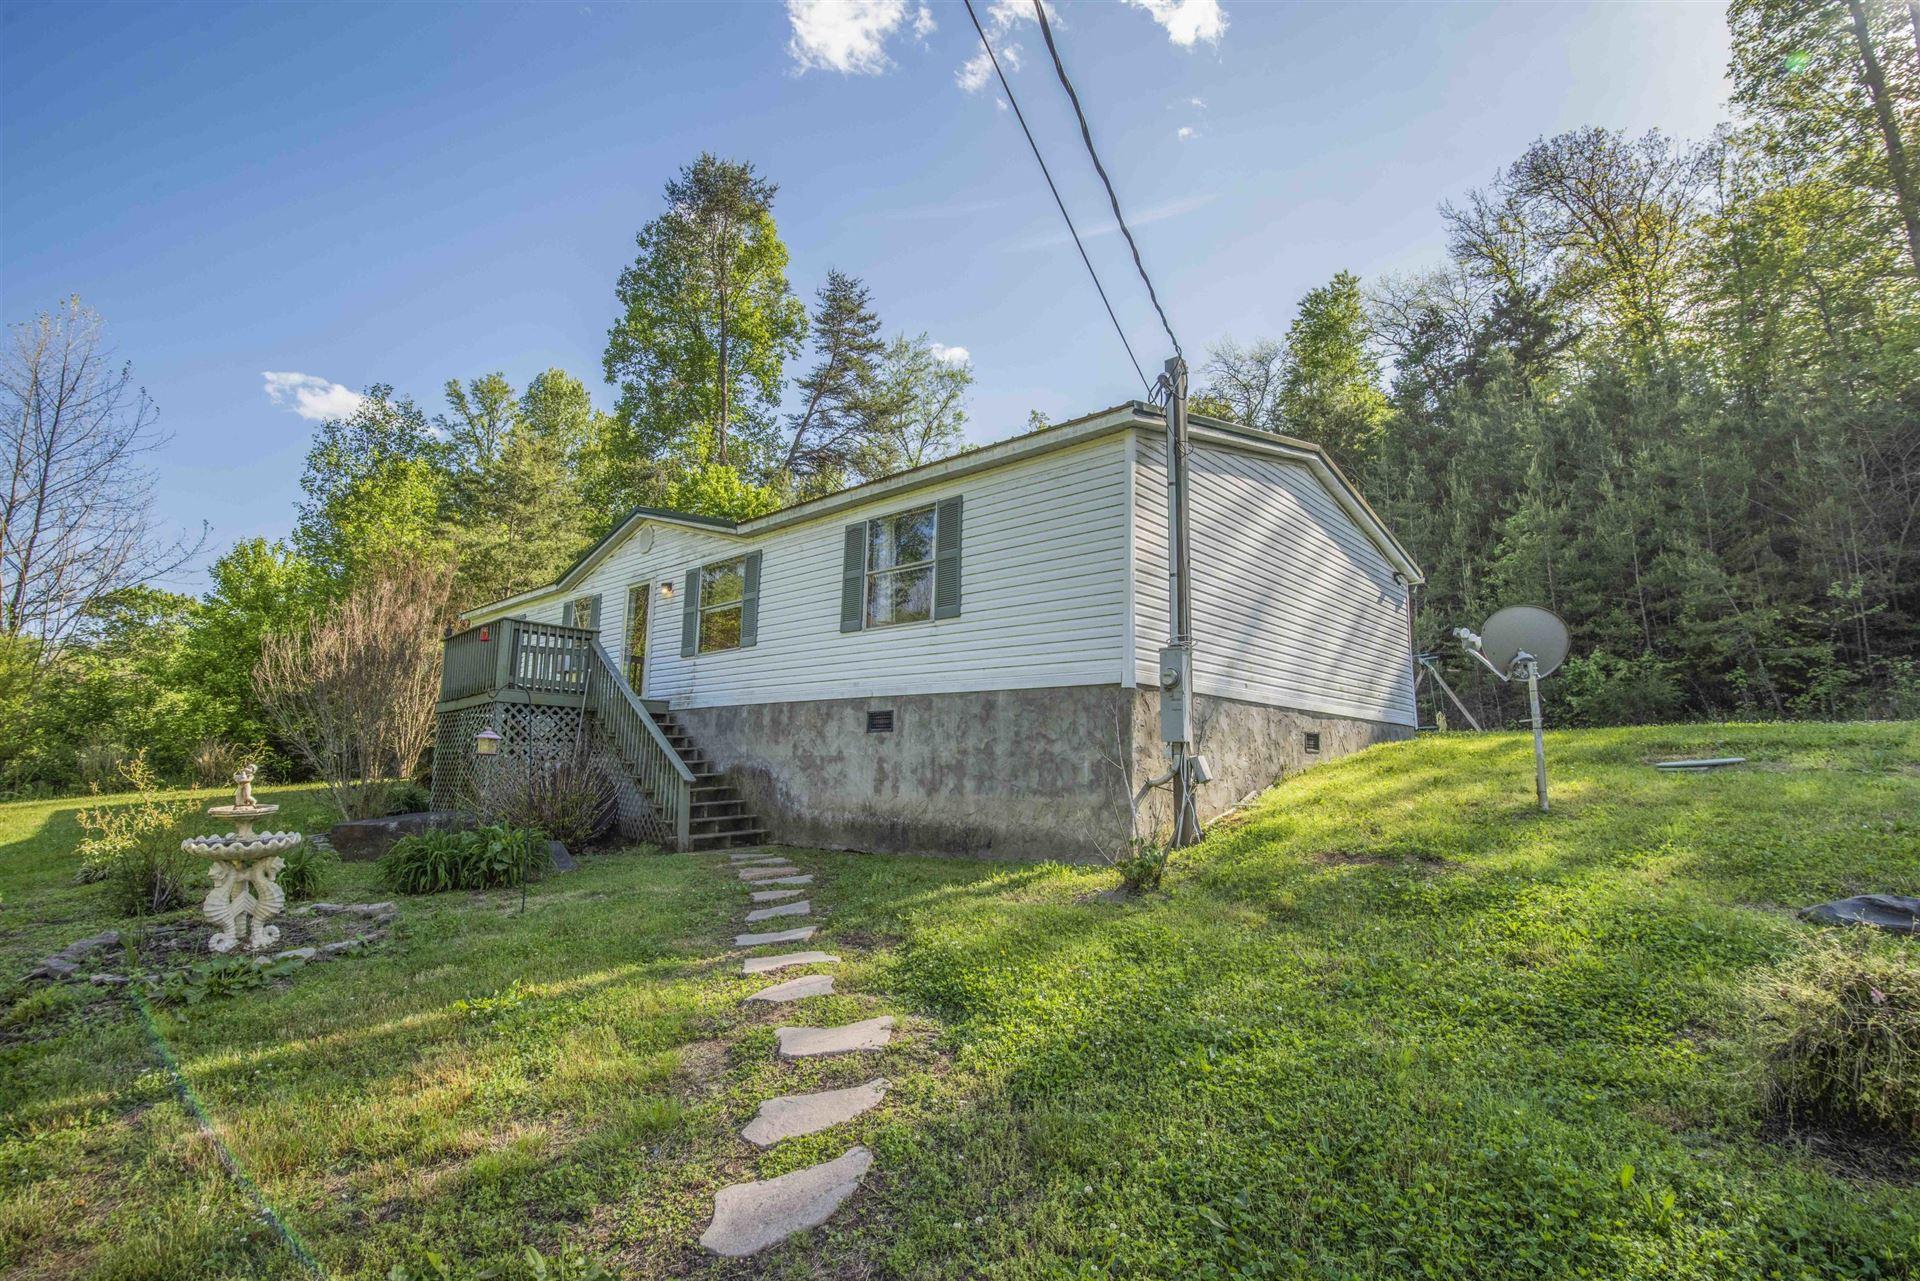 Photo of 149 Talley Lane, Clinton, TN 37716 (MLS # 1152220)